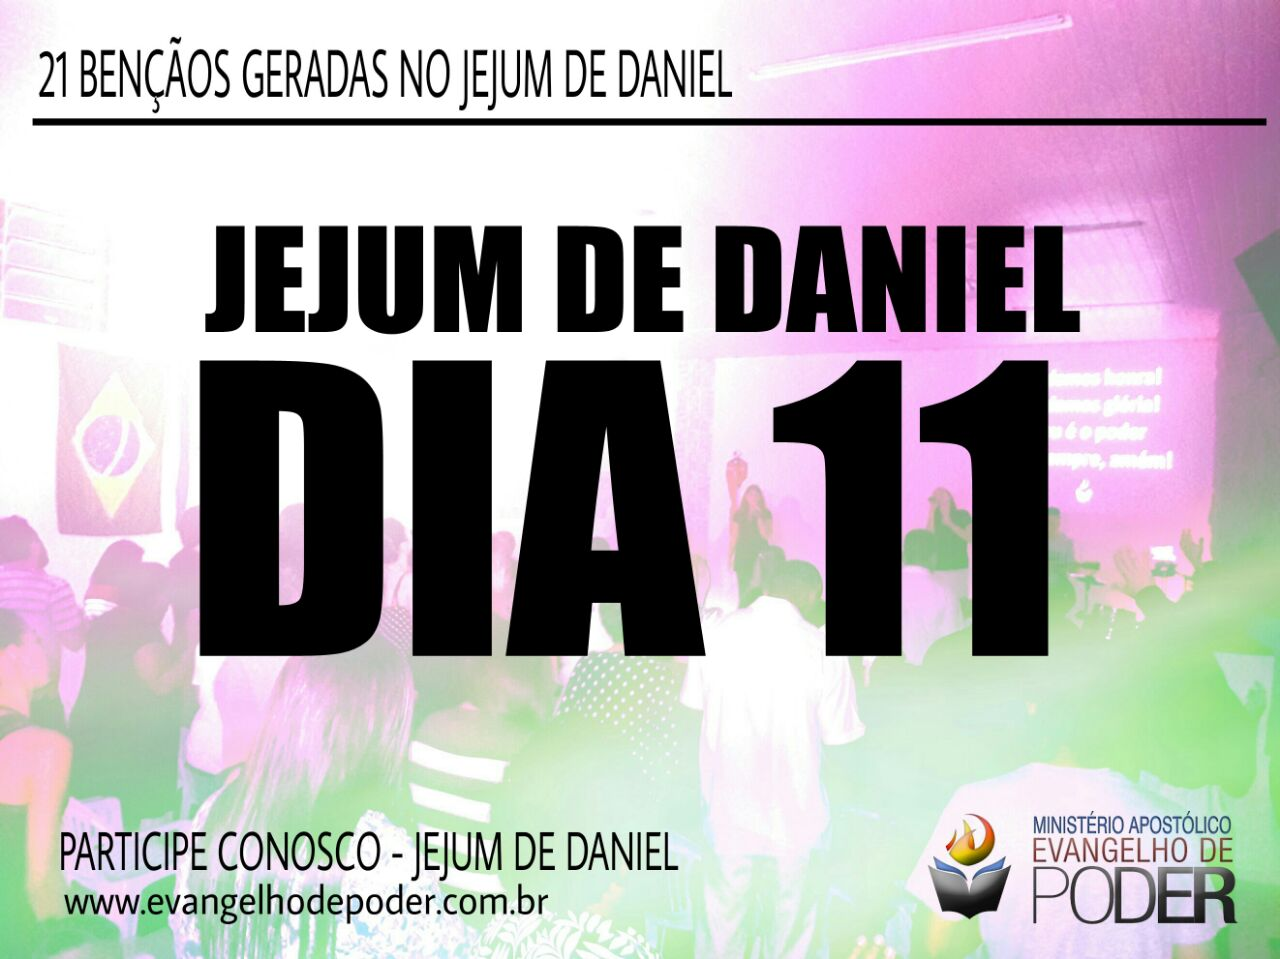 JEJUM DE DANIEL 11° DIA